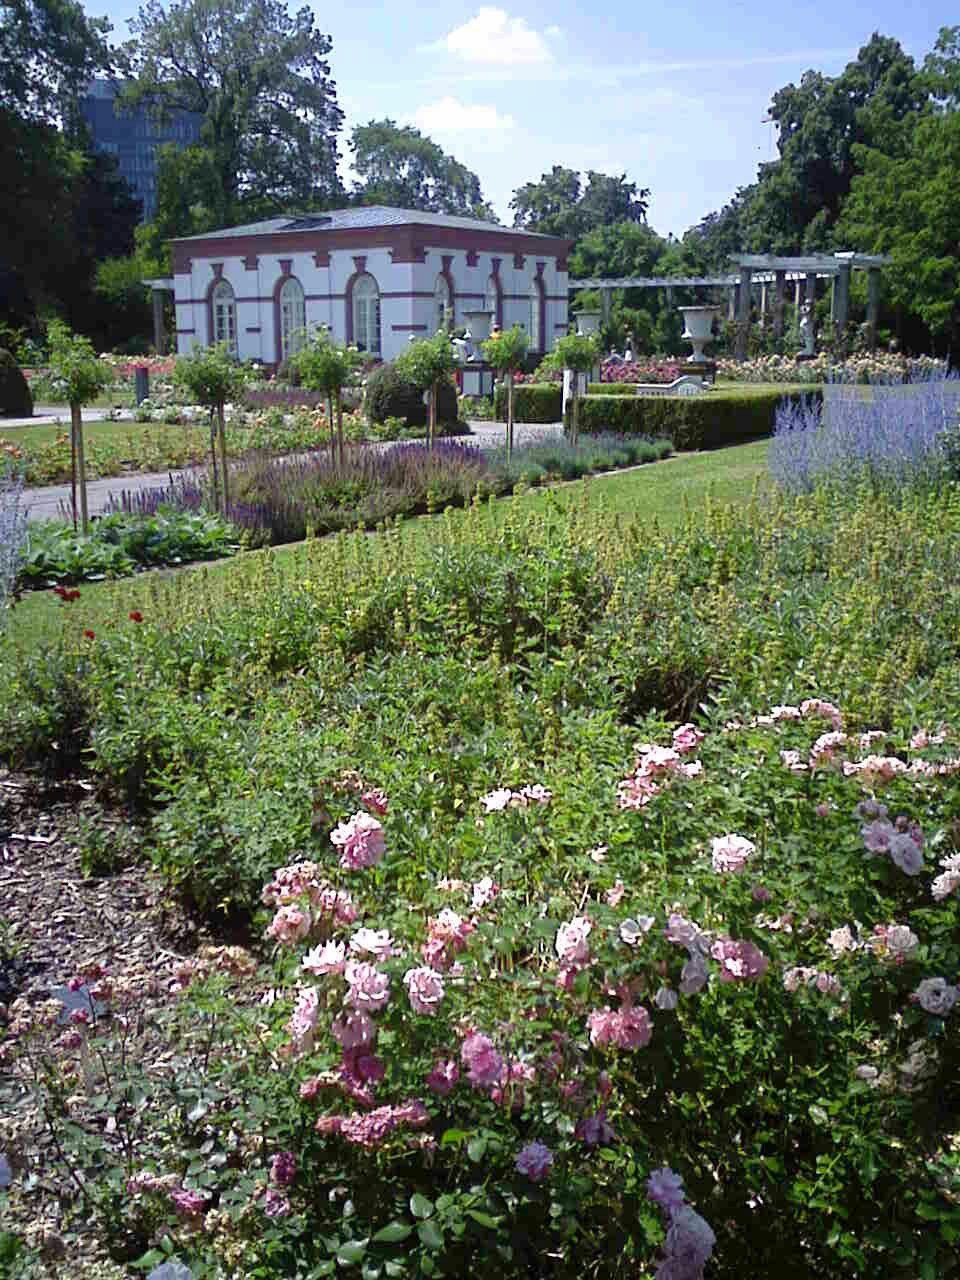 Botanicki Vrt Frankfurt With Images Places To Go Plants Places